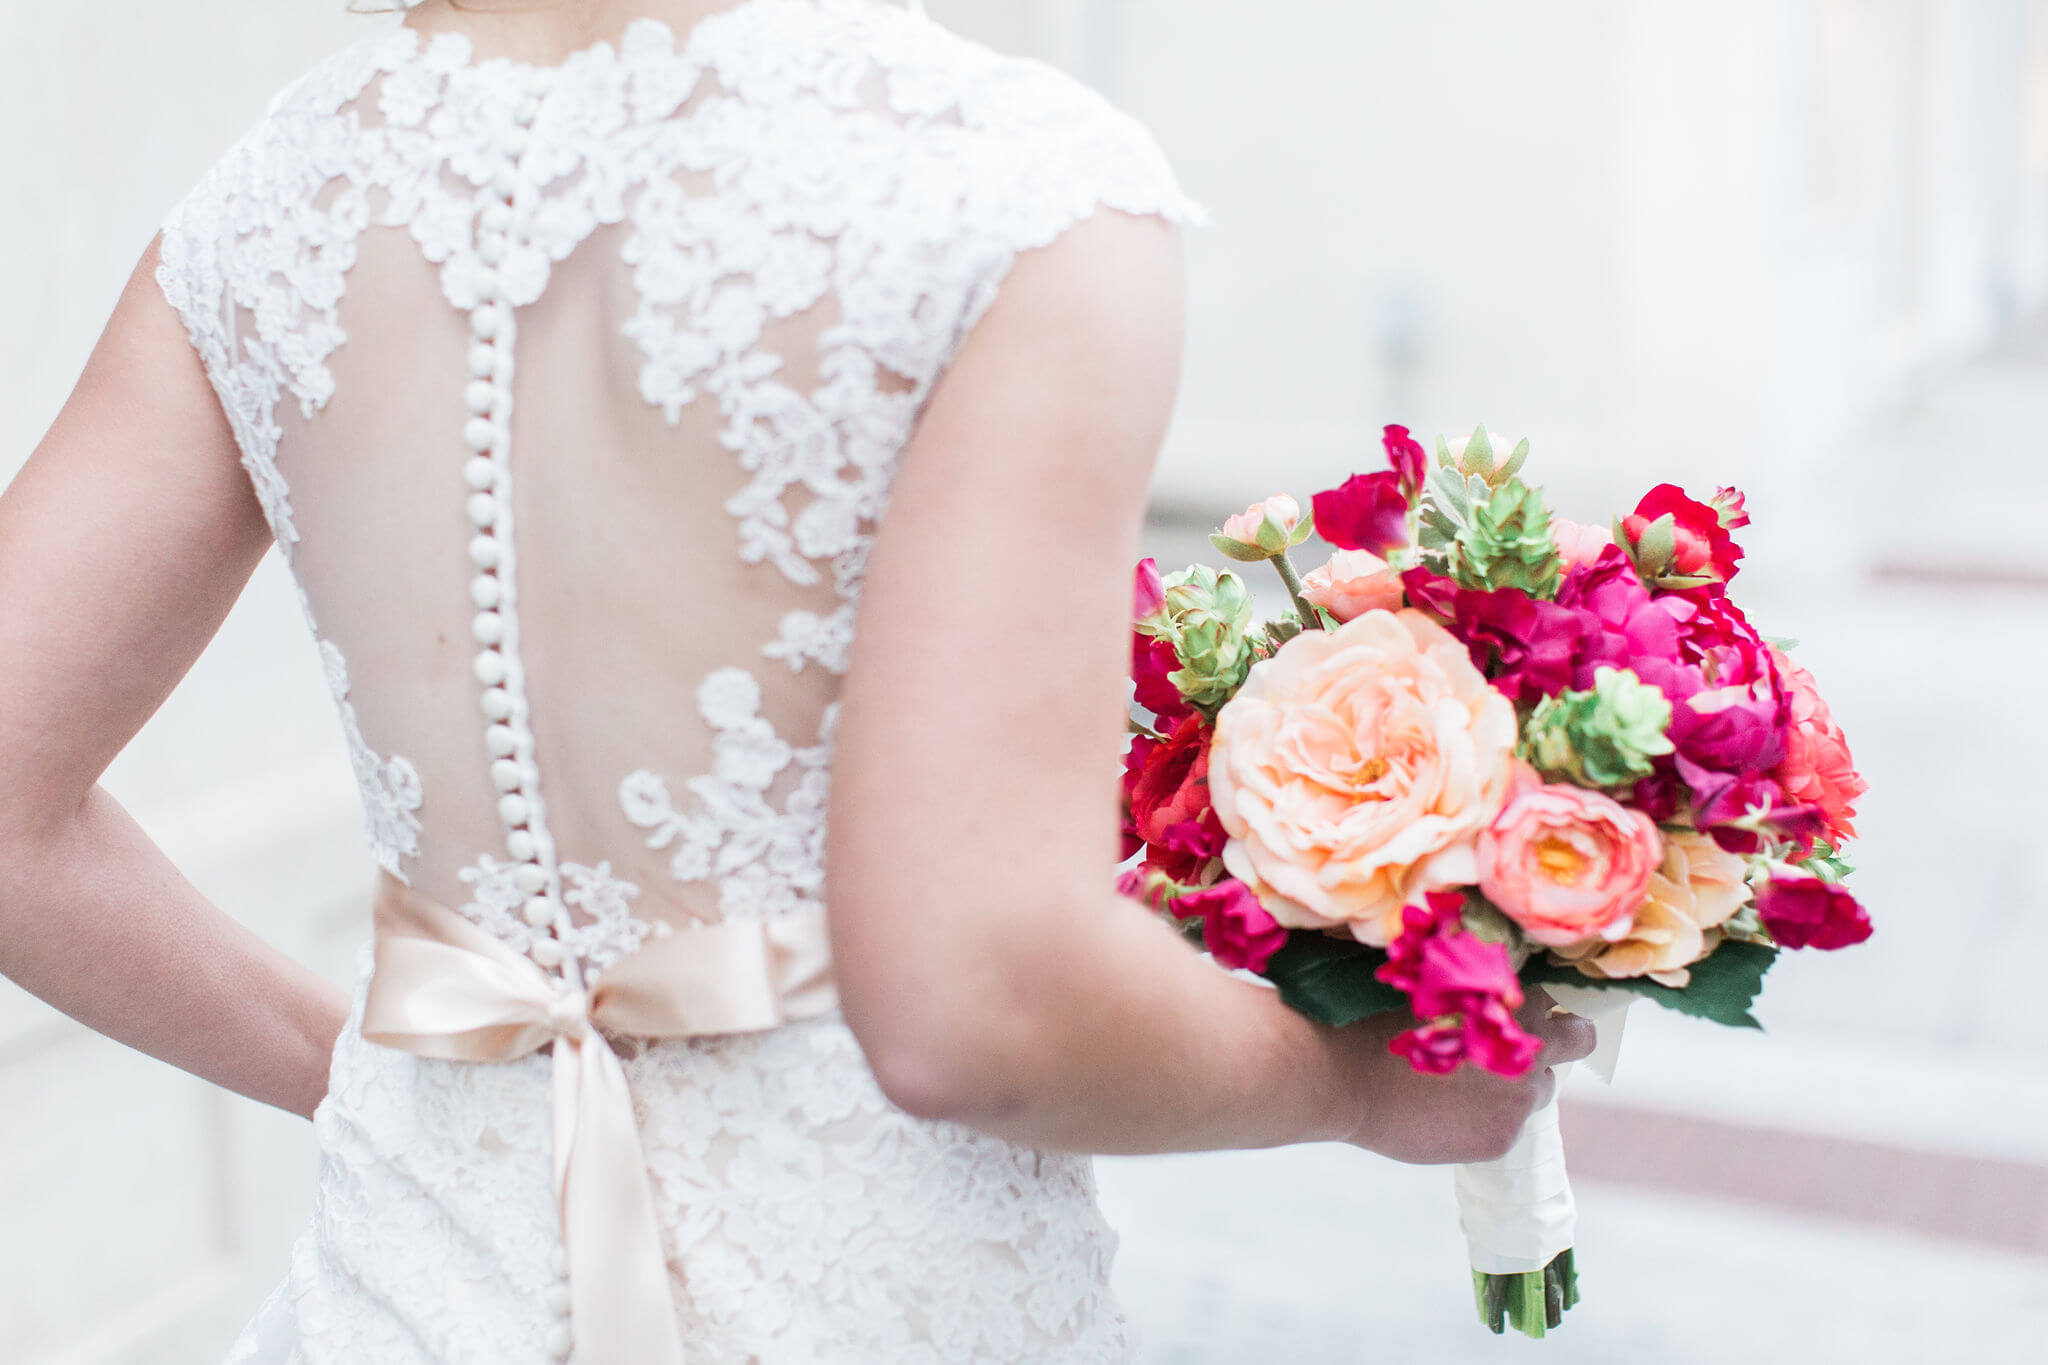 apt-b-photography-savannah-wedding-photographer-savannah-wedding-savannah-elopement-intimate-wedding-photographer-87.JPG